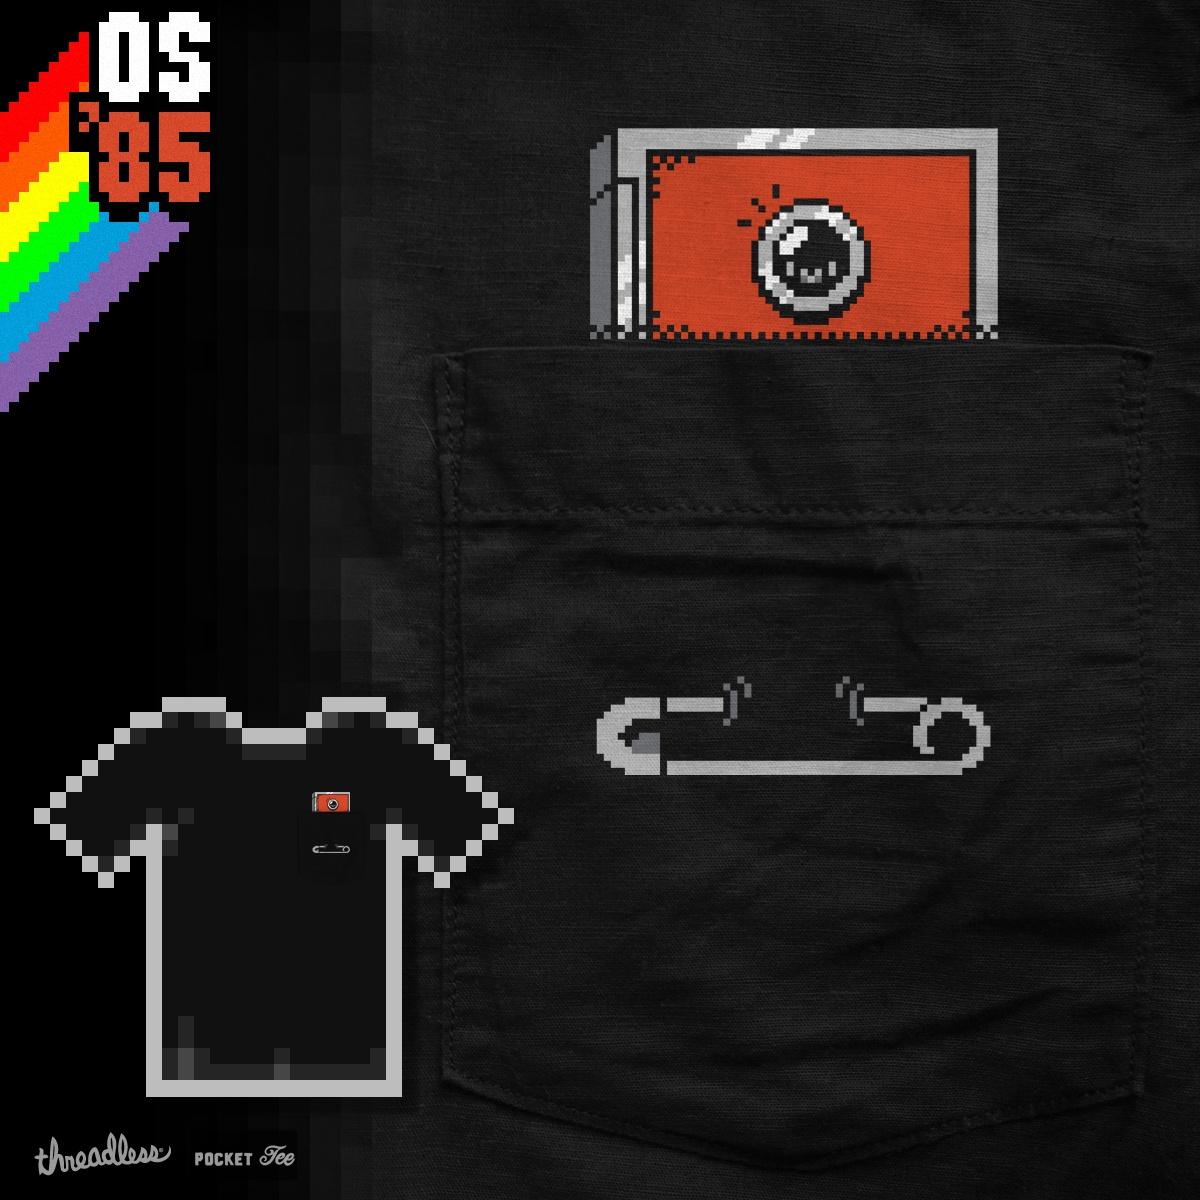 Me & My OS '85 by Morkki on Threadless